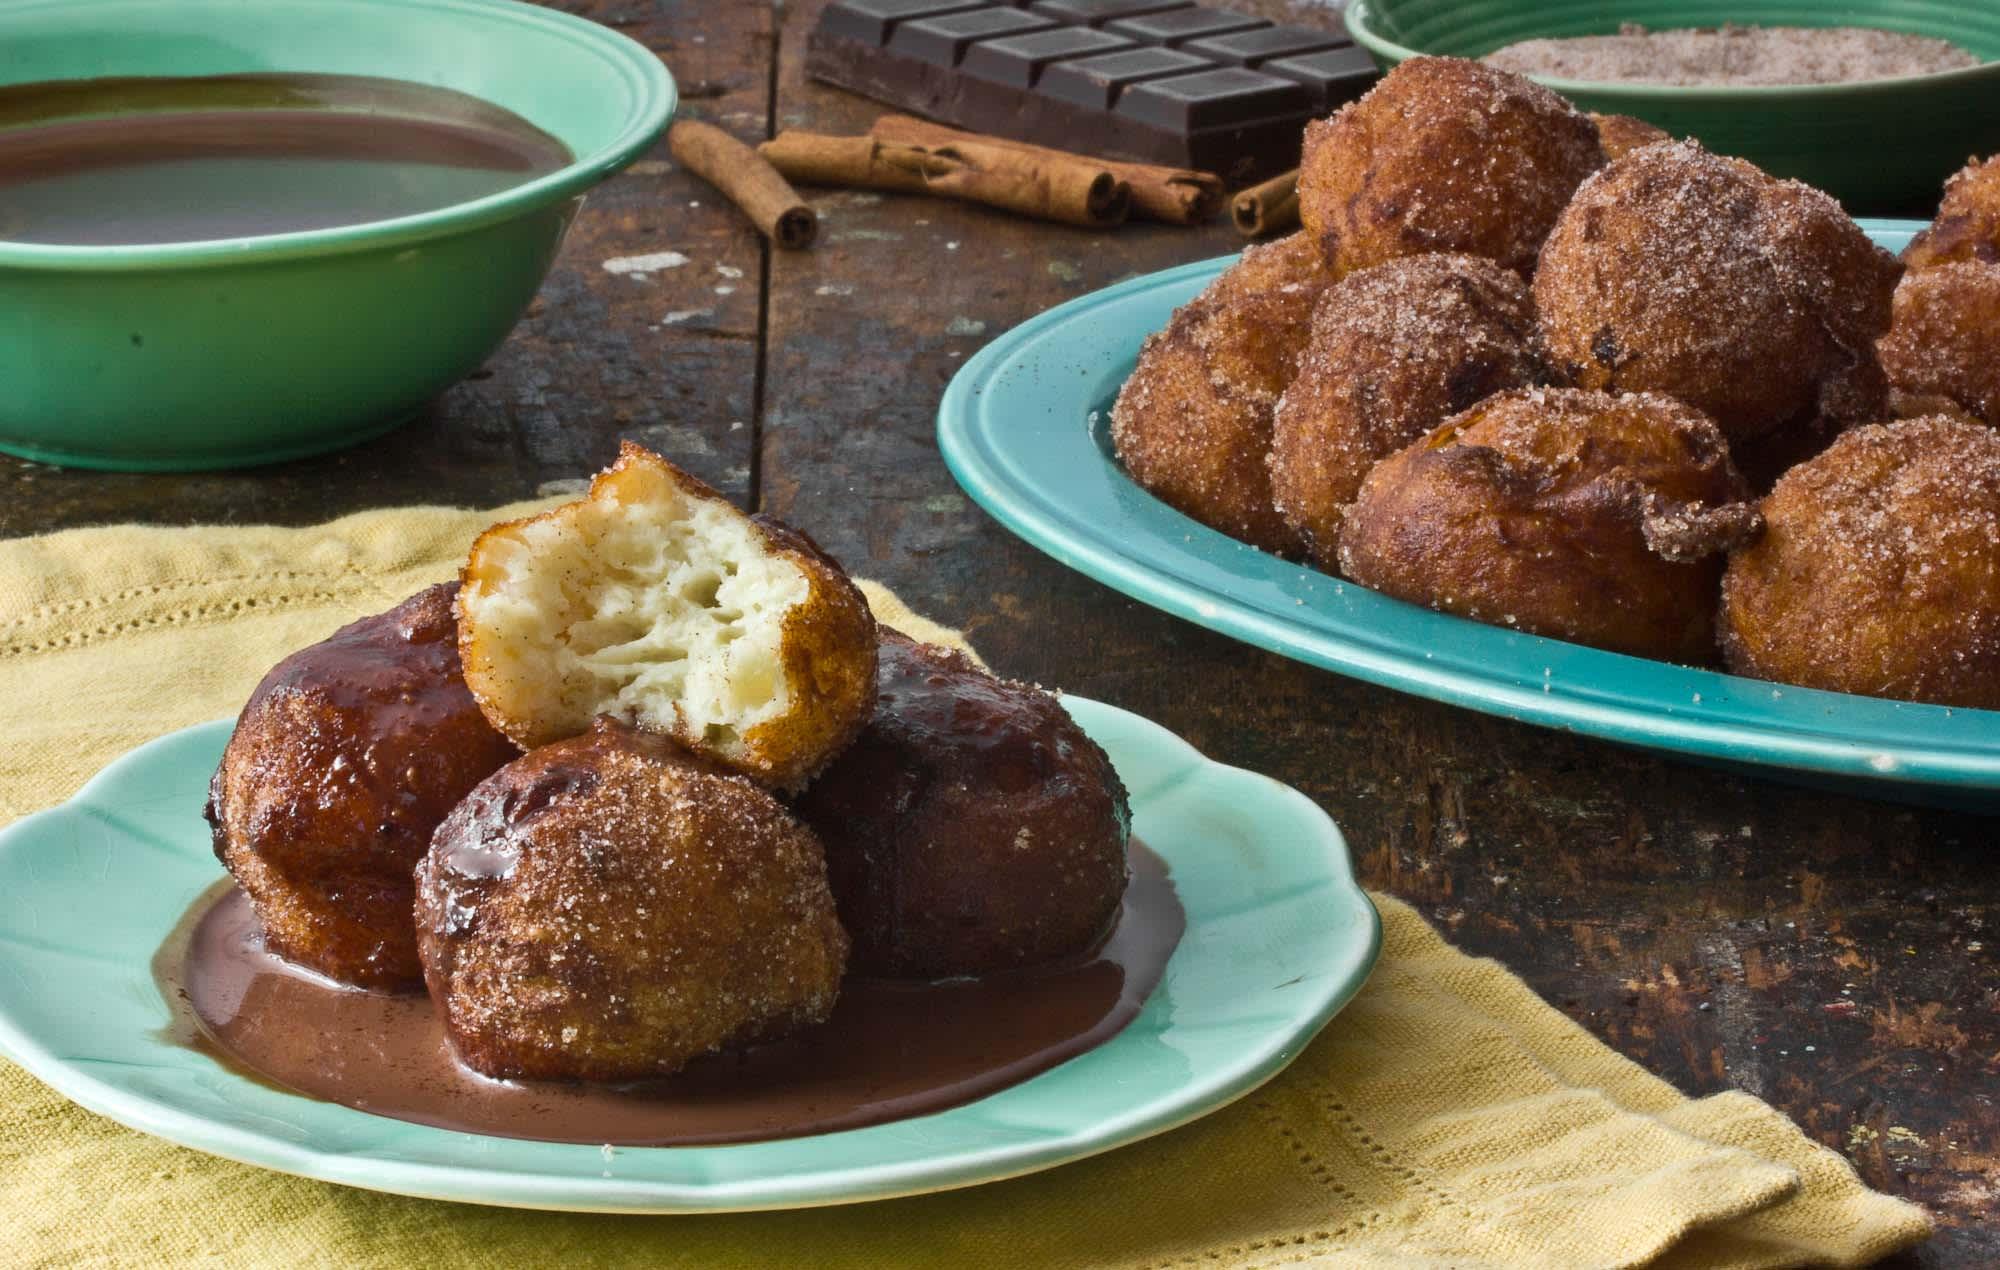 Dessert Recipe: Churros and Chocolate